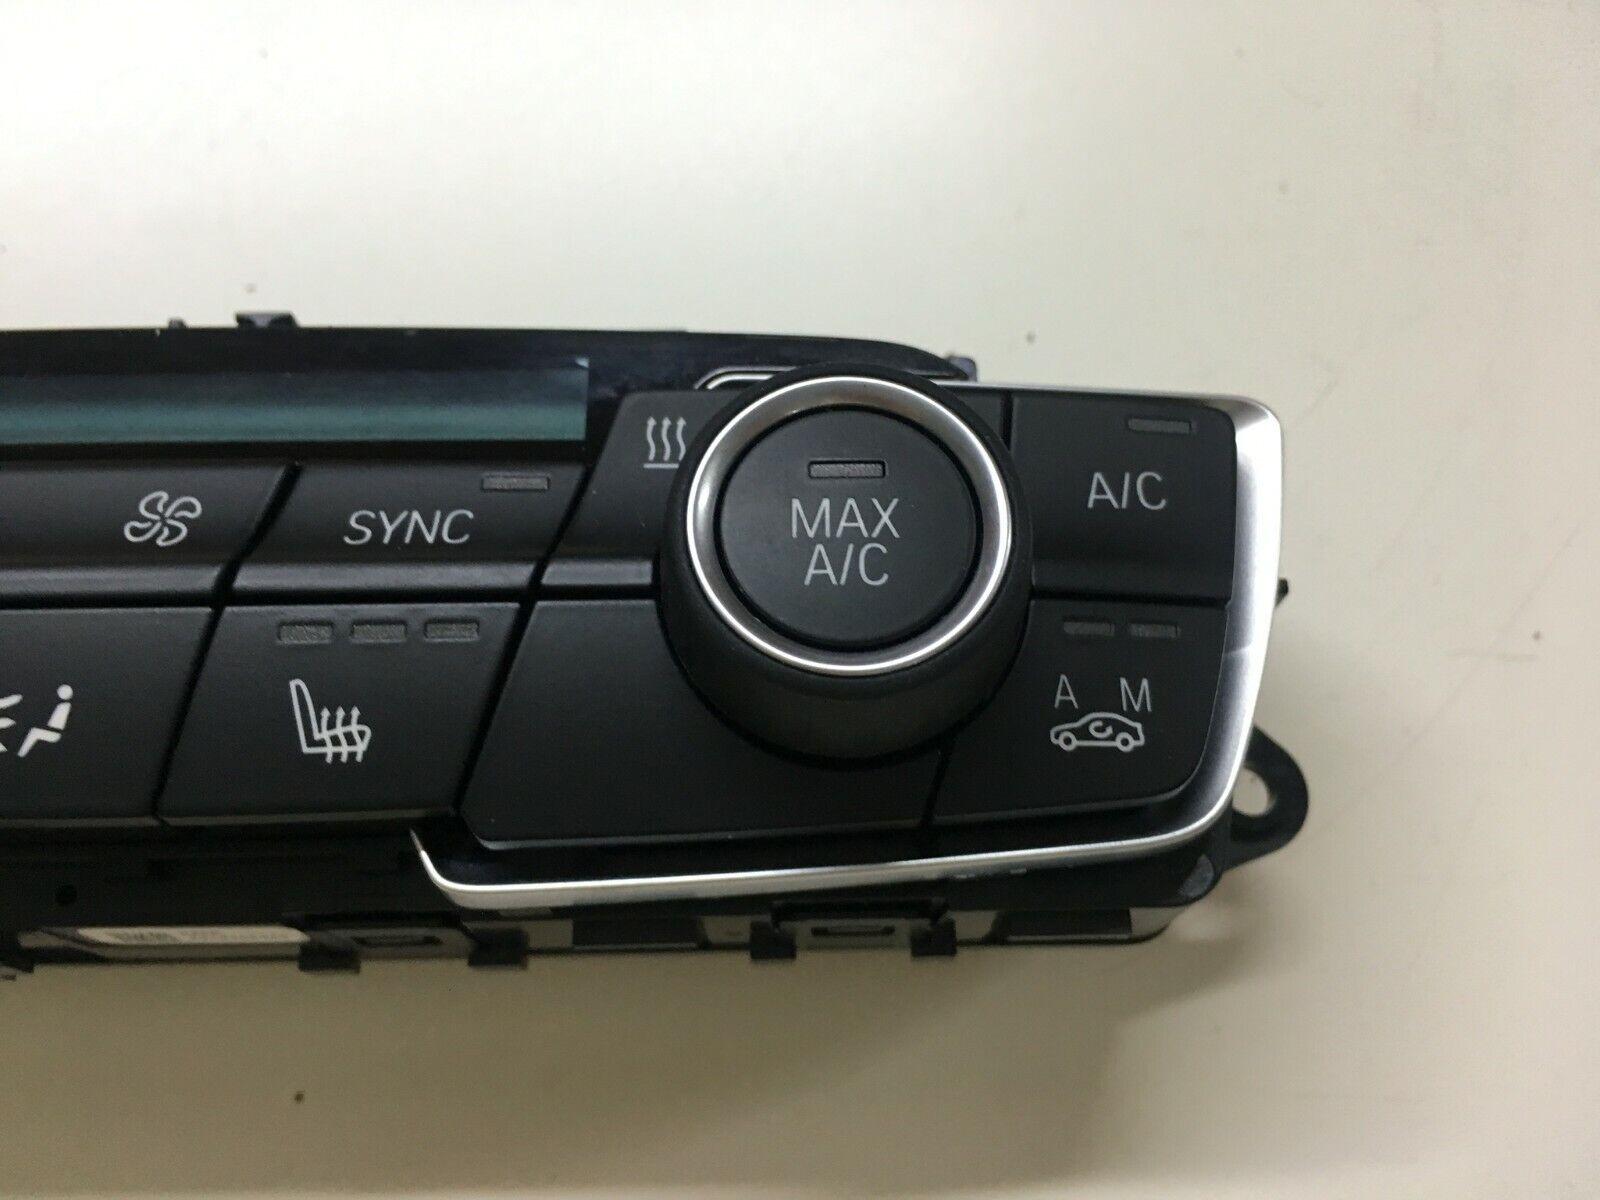 CD audio radio control panel 9371460 BMW X1 F48 Climate control unit